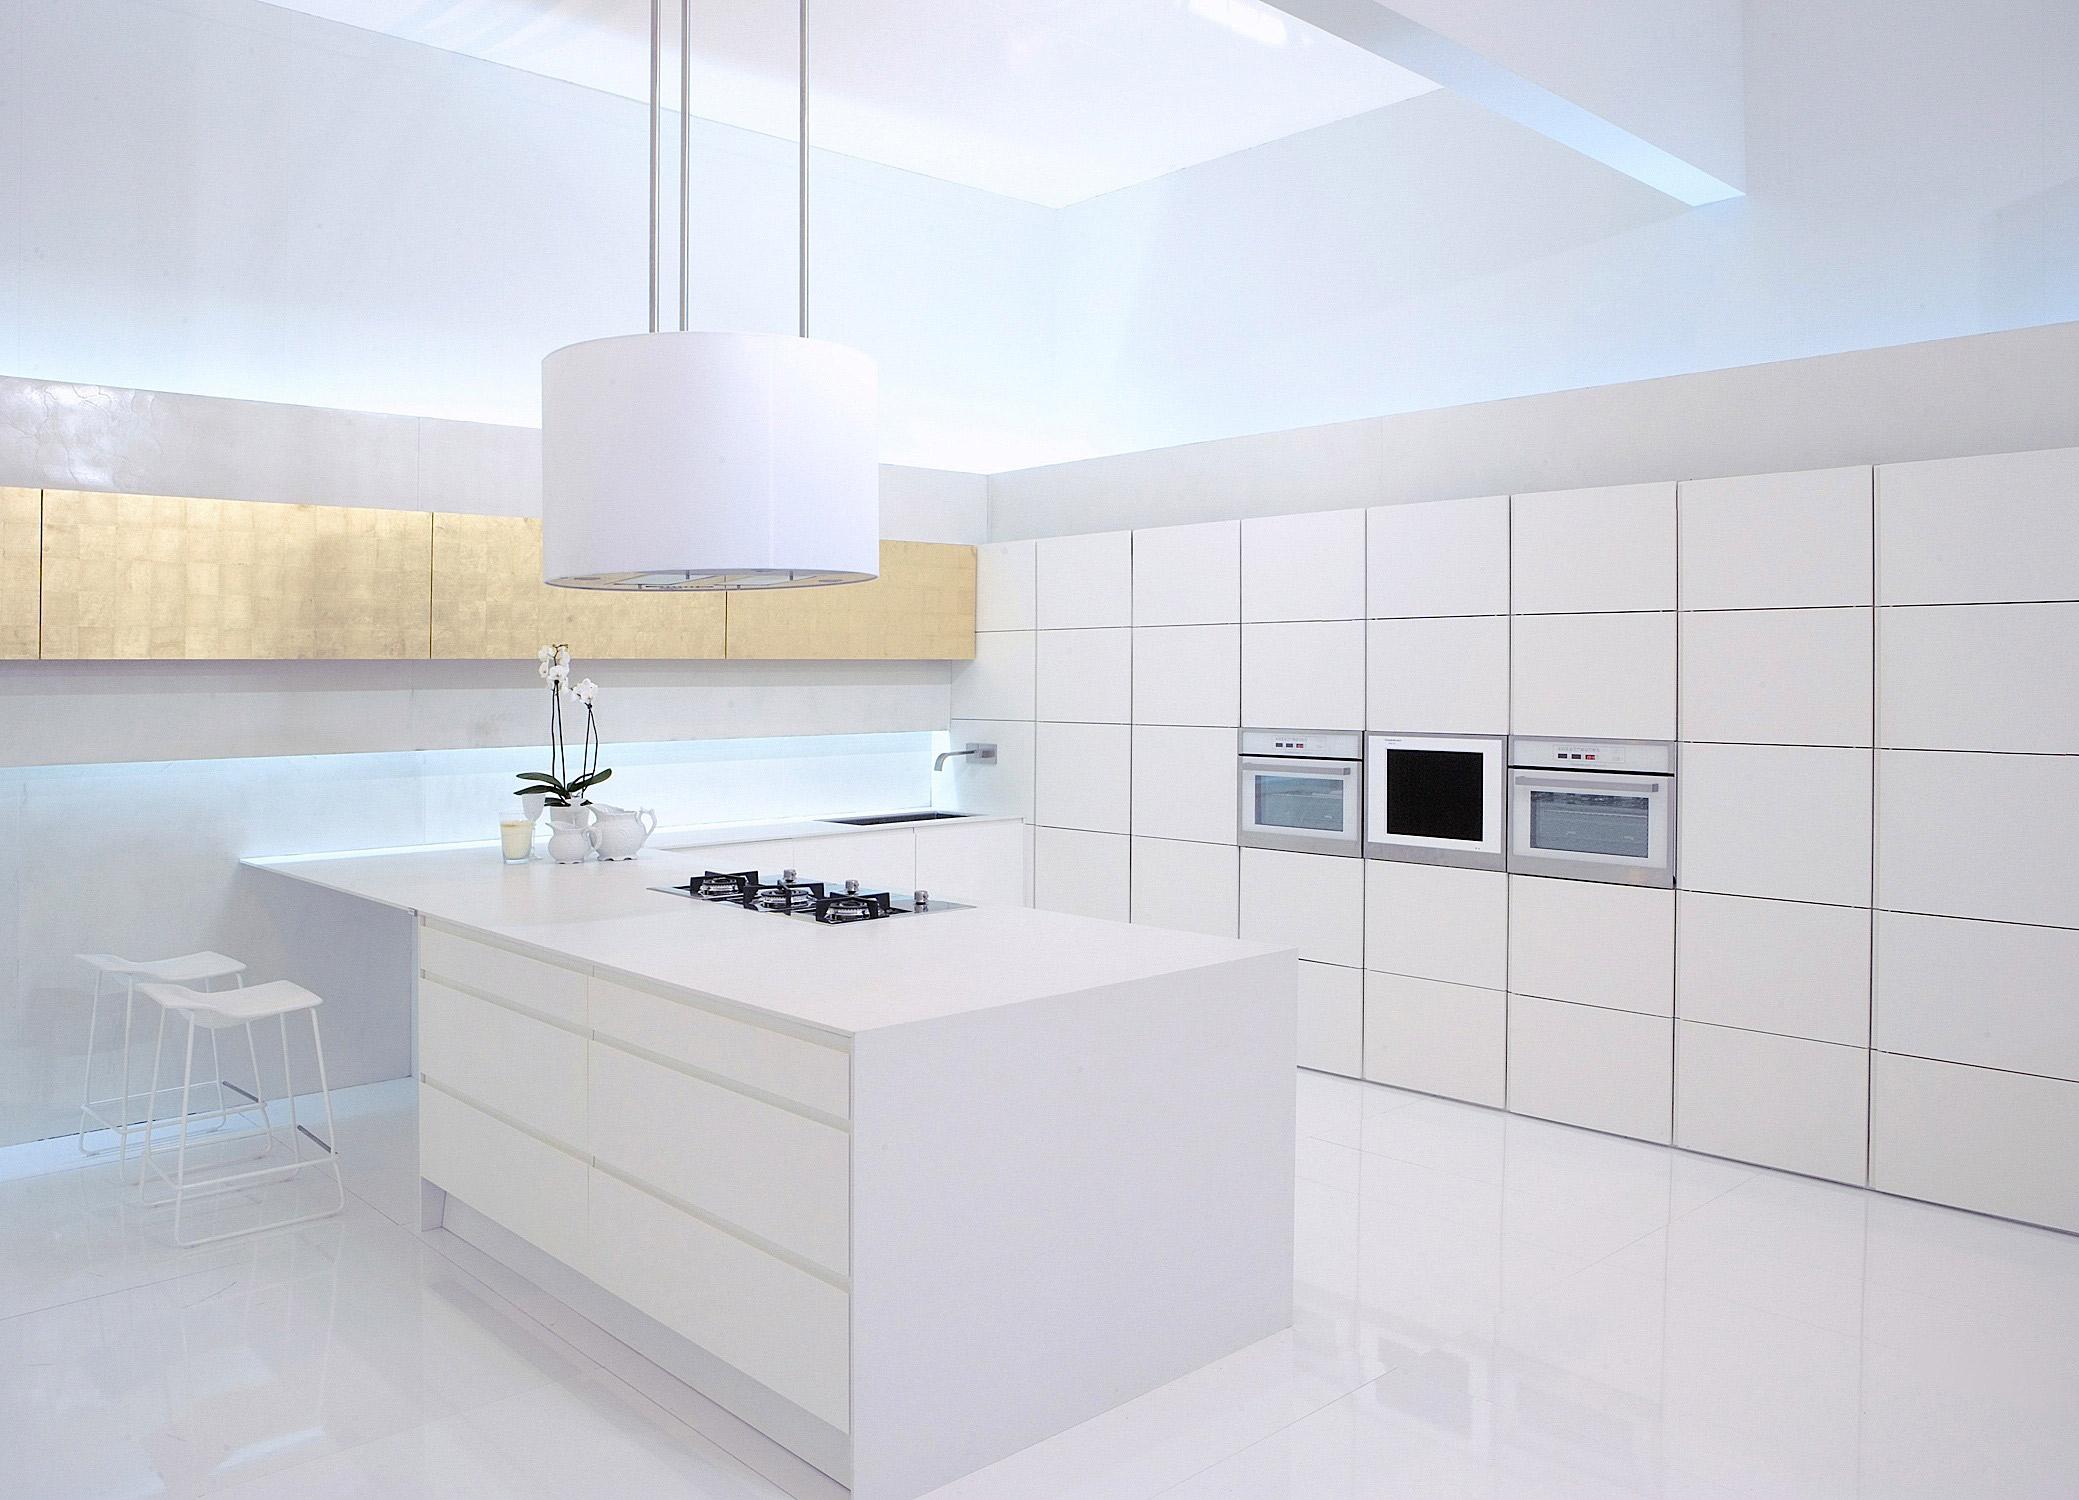 Konglomerat kwarcowy silestone for Cocinas blancas con silestone